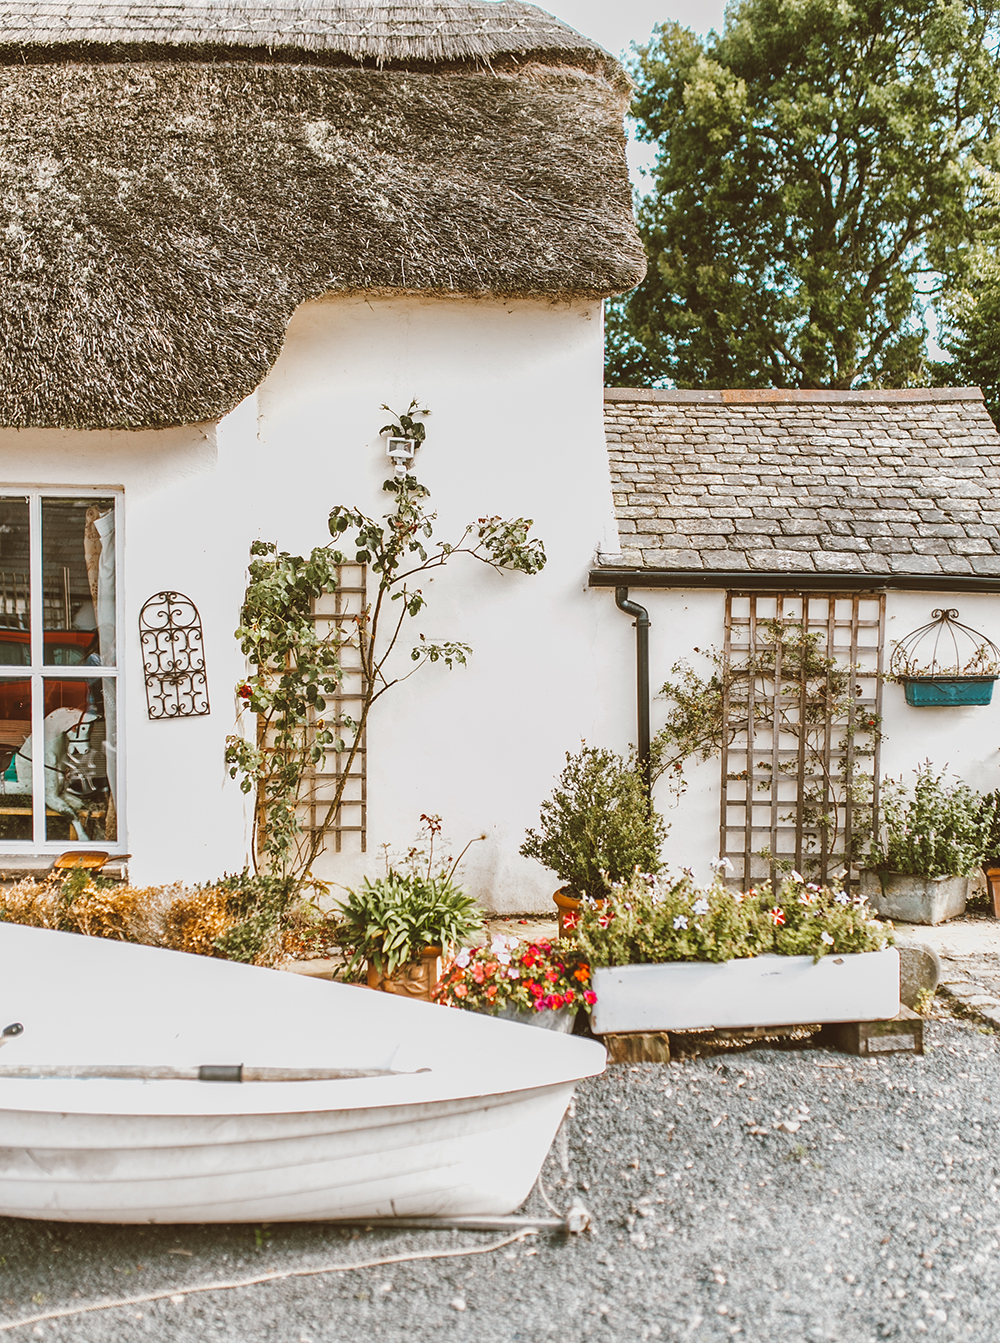 livvyland-blog-olivia-watson-austin-texas-travel-blogger-belfast-northern-ireland-irish-soda-bread-recipe-princess-cruises-excursion-9